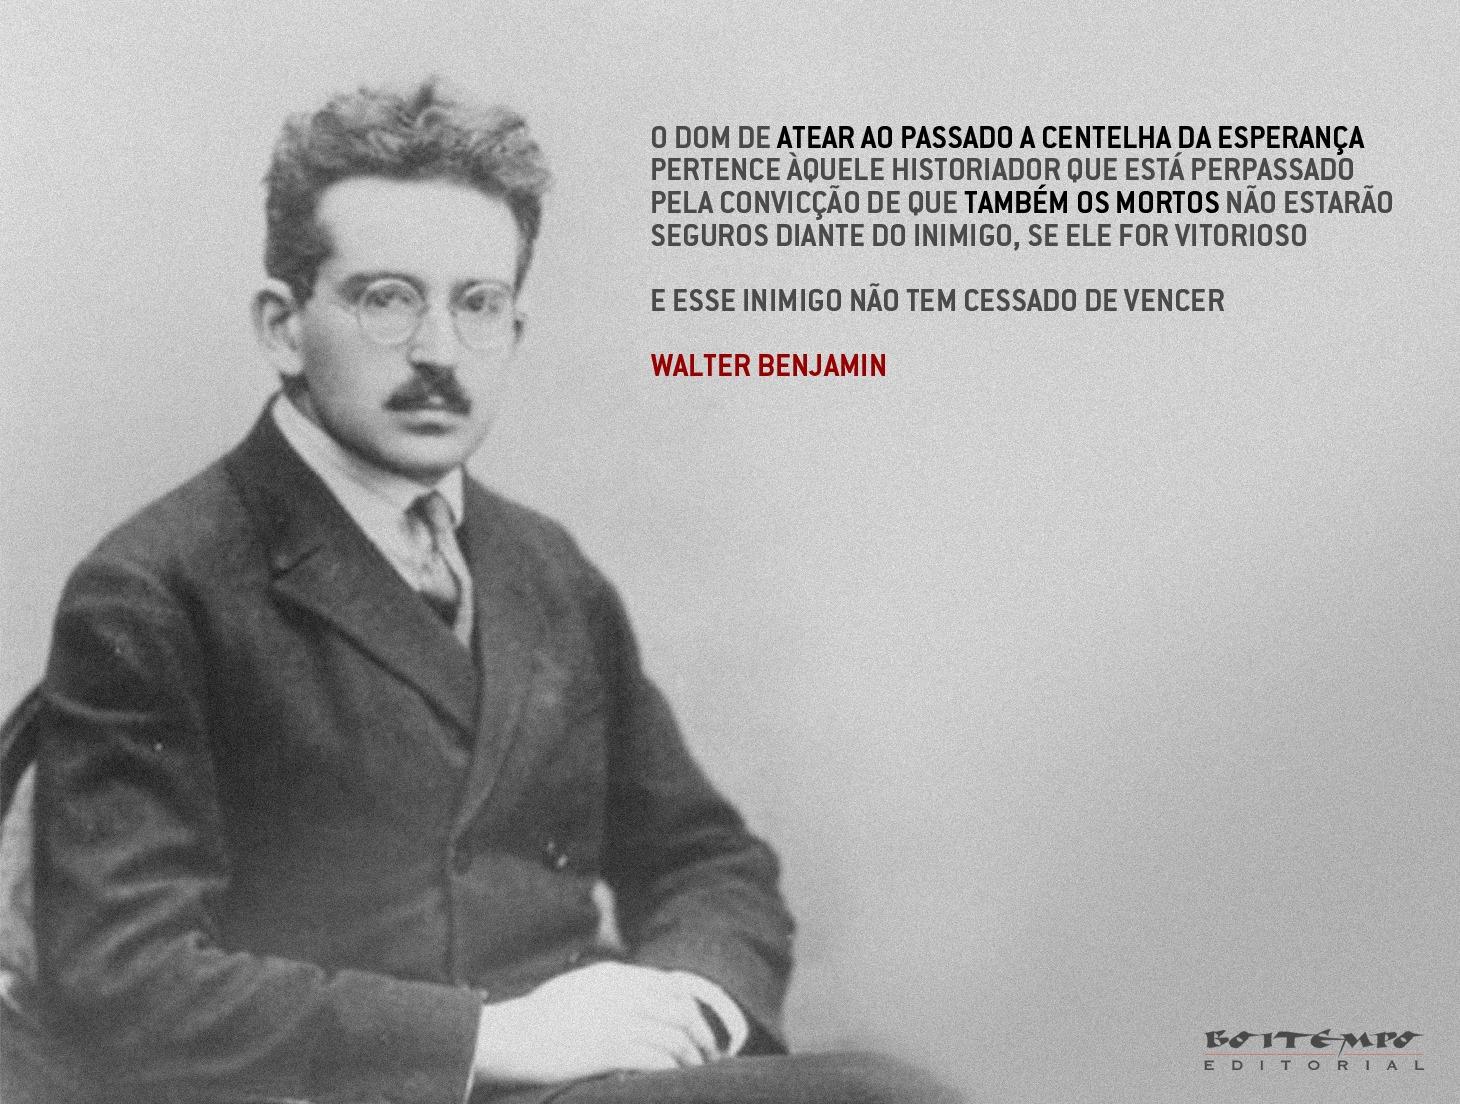 Walter Benjamin Comentado Por Marilena Chauí A Casa De Vidro